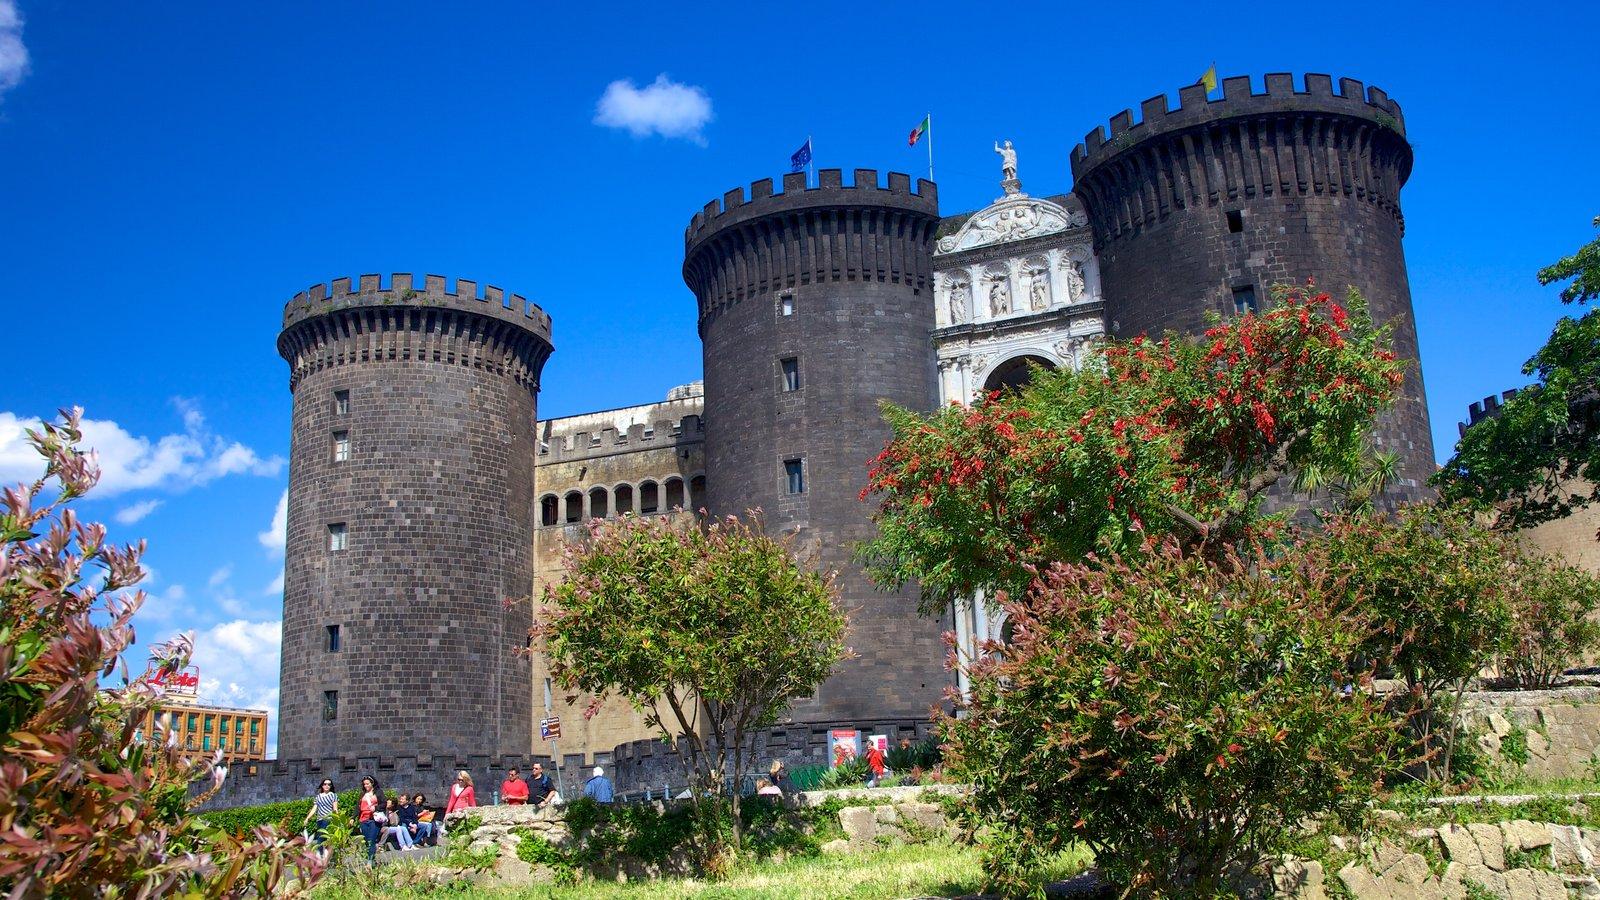 Piazza del Municipio caracterizando arquitetura de patrimônio e um castelo